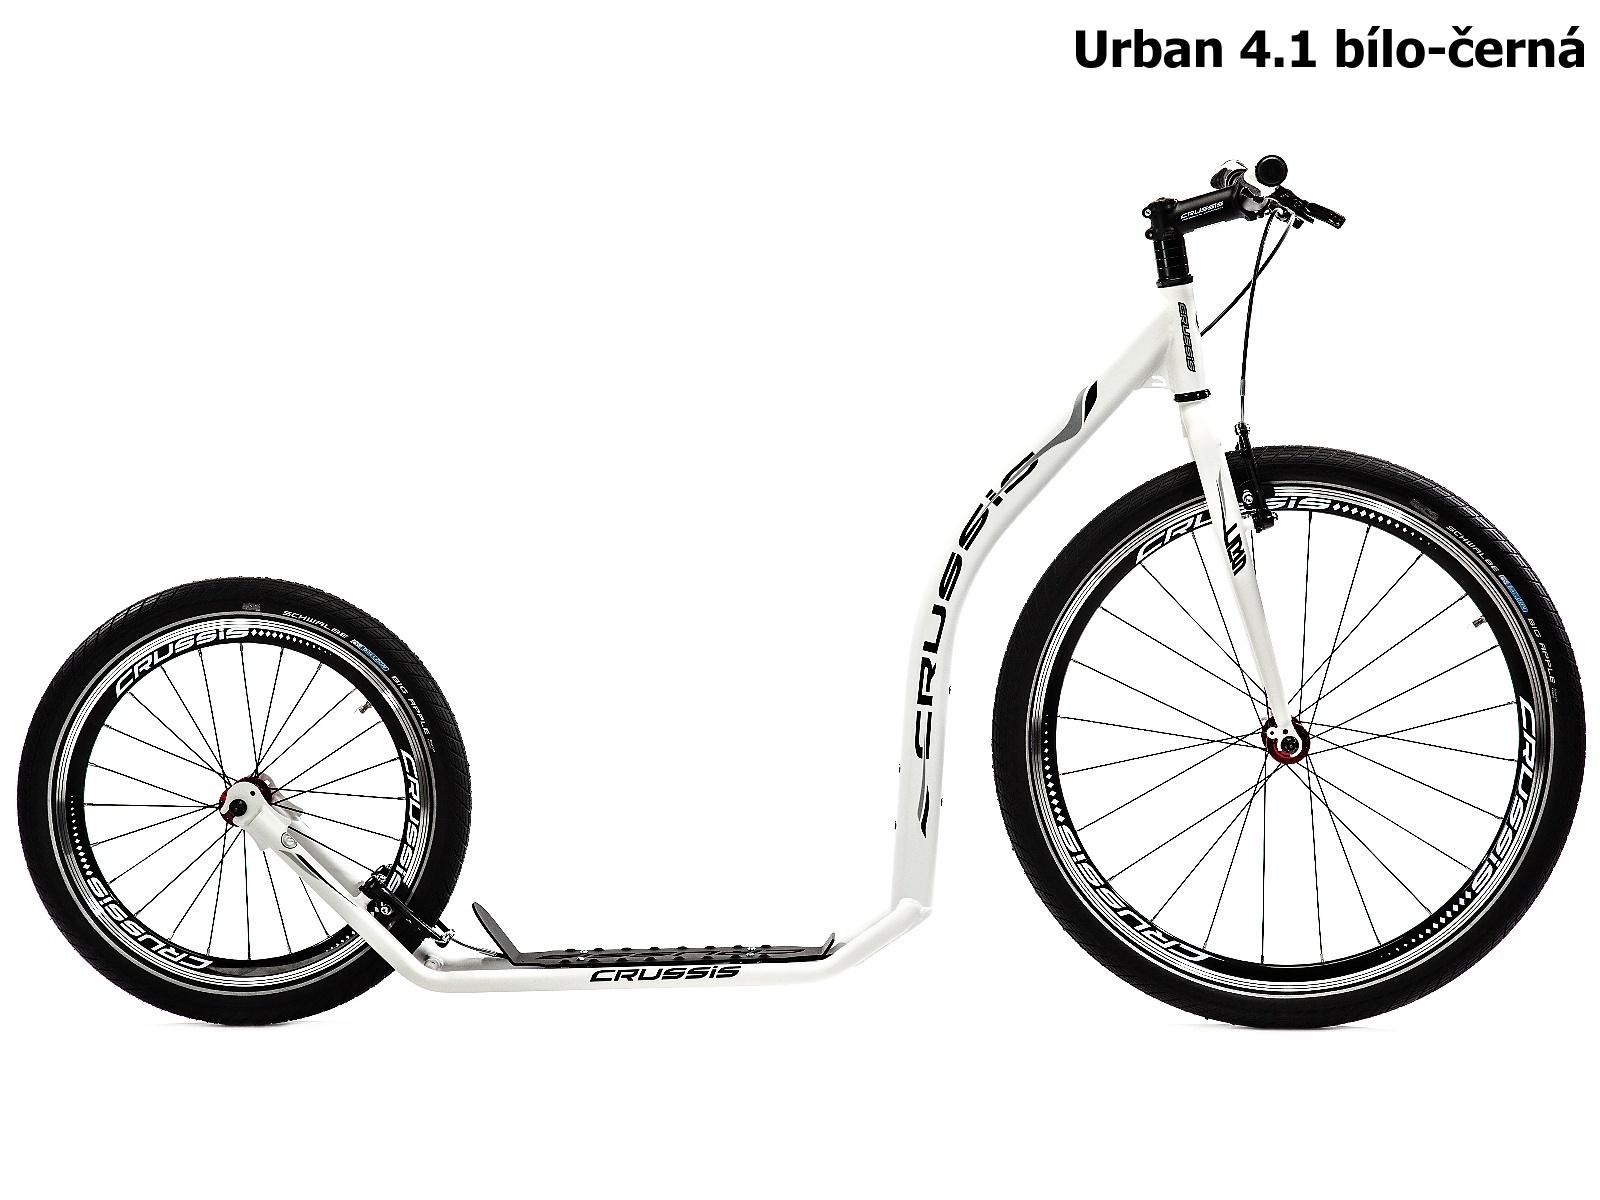 Koloběžka CRUSSIS Urban 4.1 bílo-černá